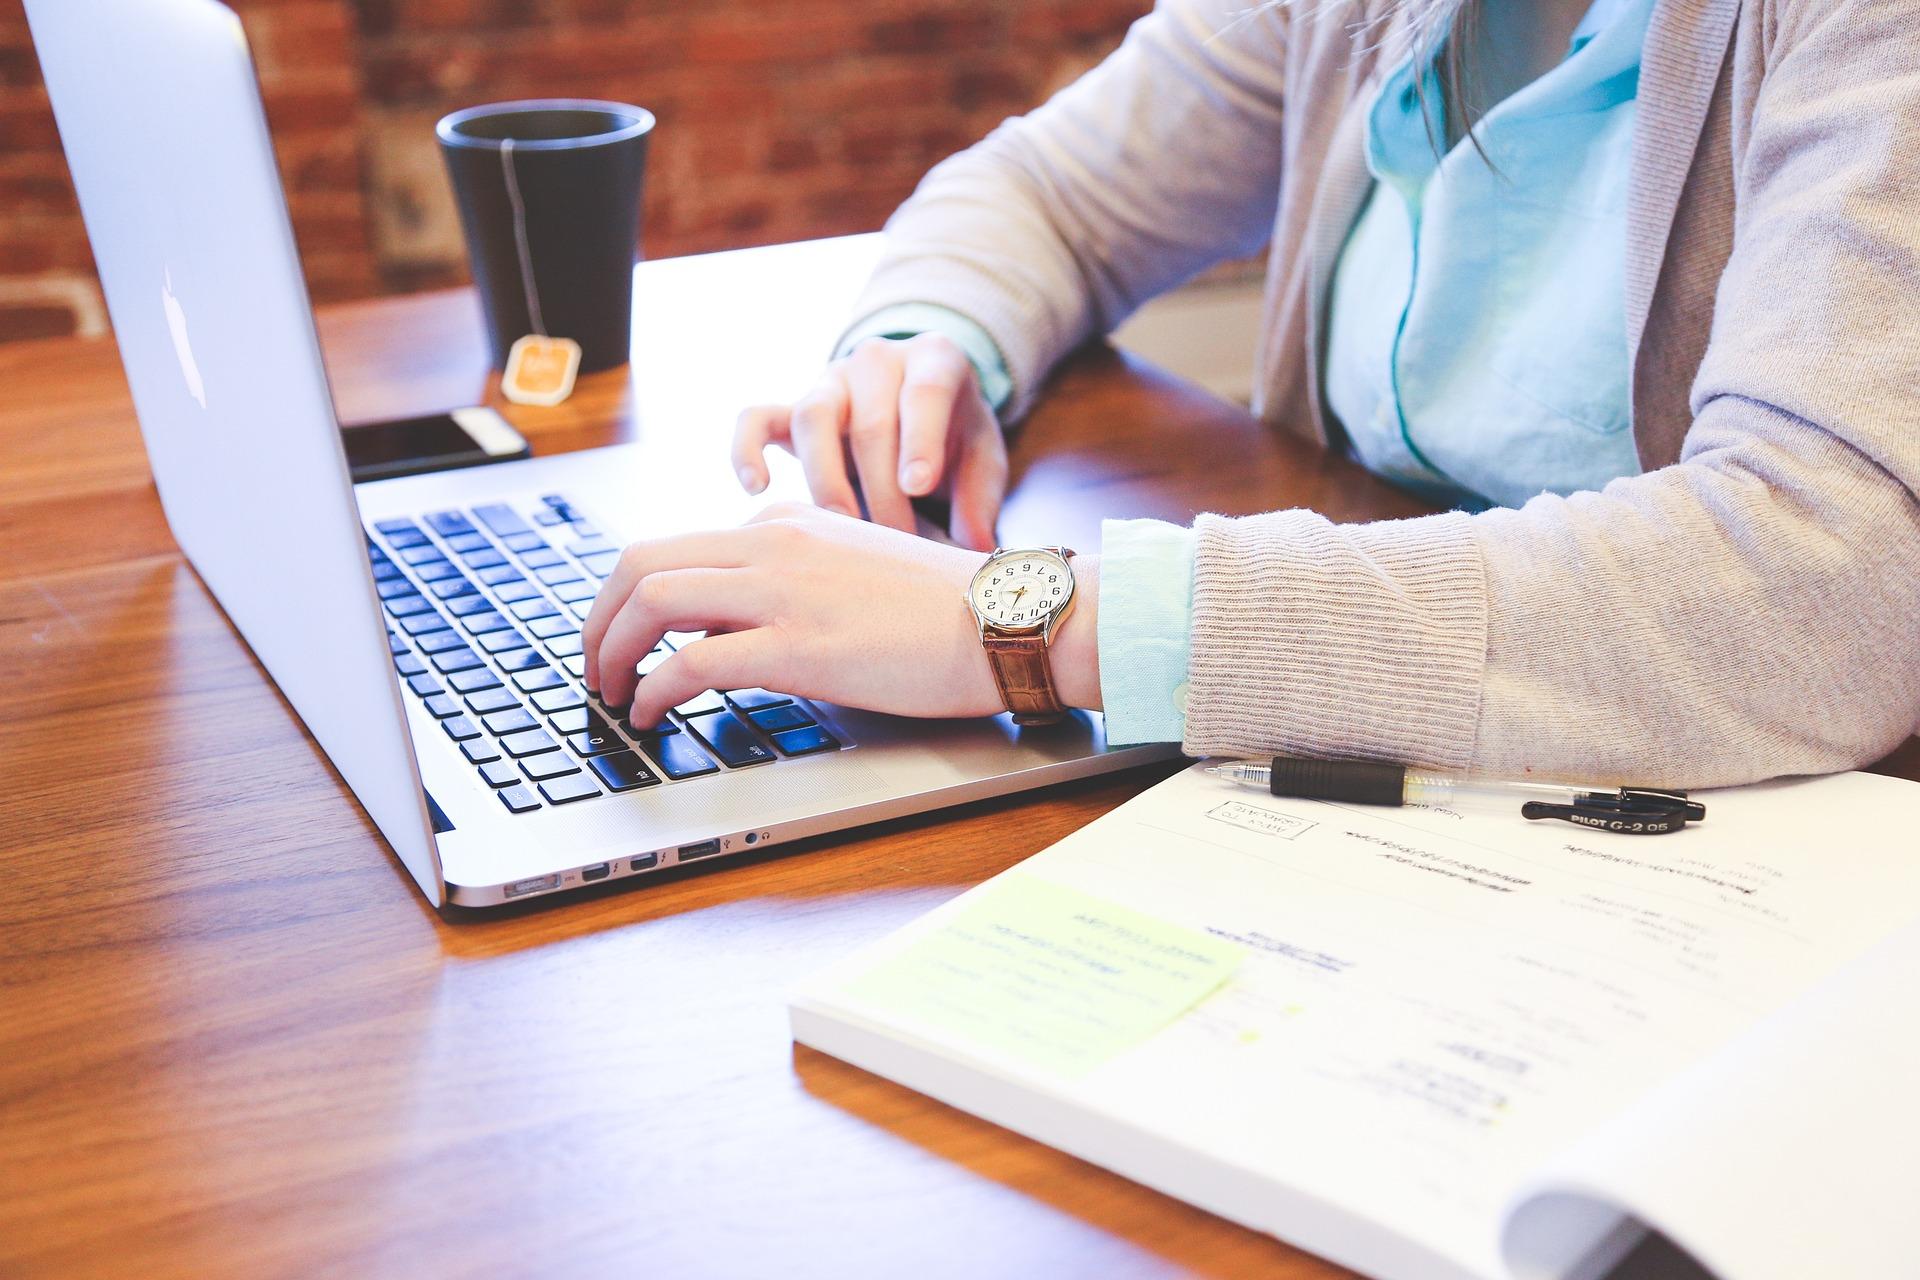 5 Amazing Ways to Personalize Your Digital Marketing Strategy